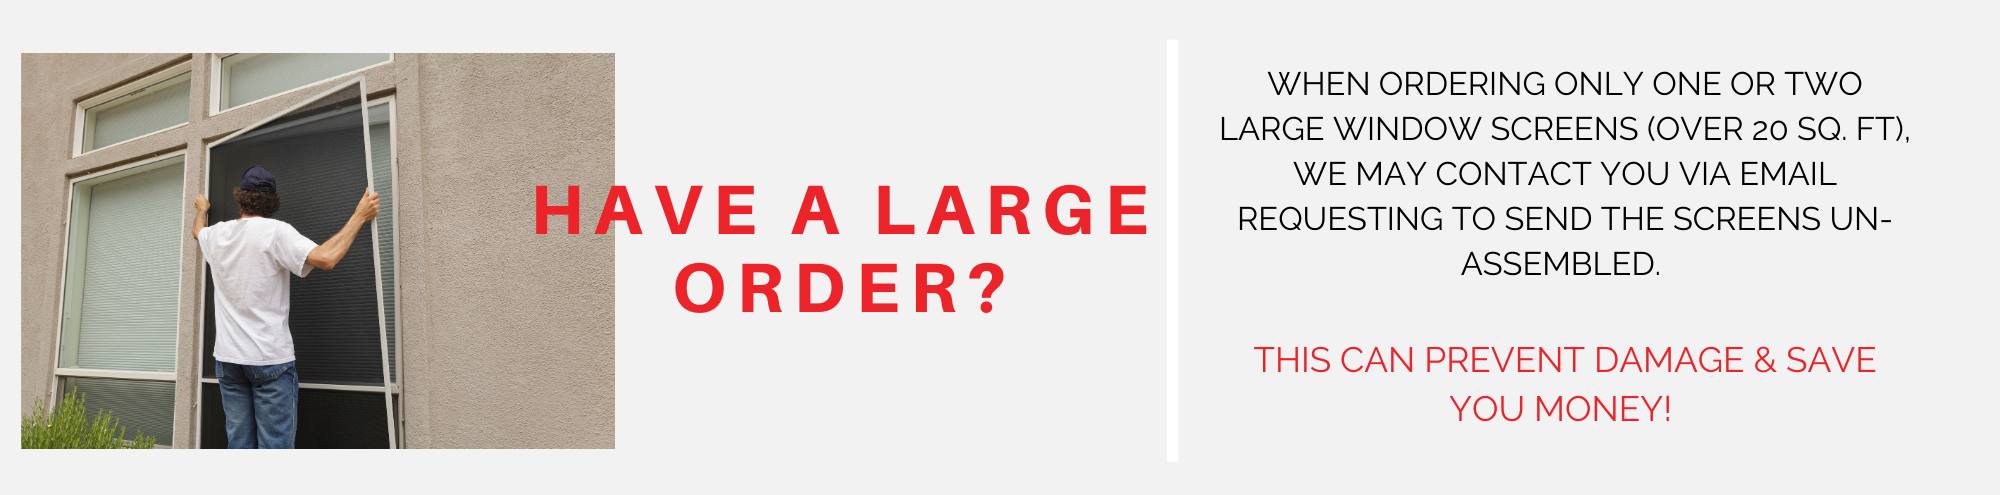 large-order-cws.png